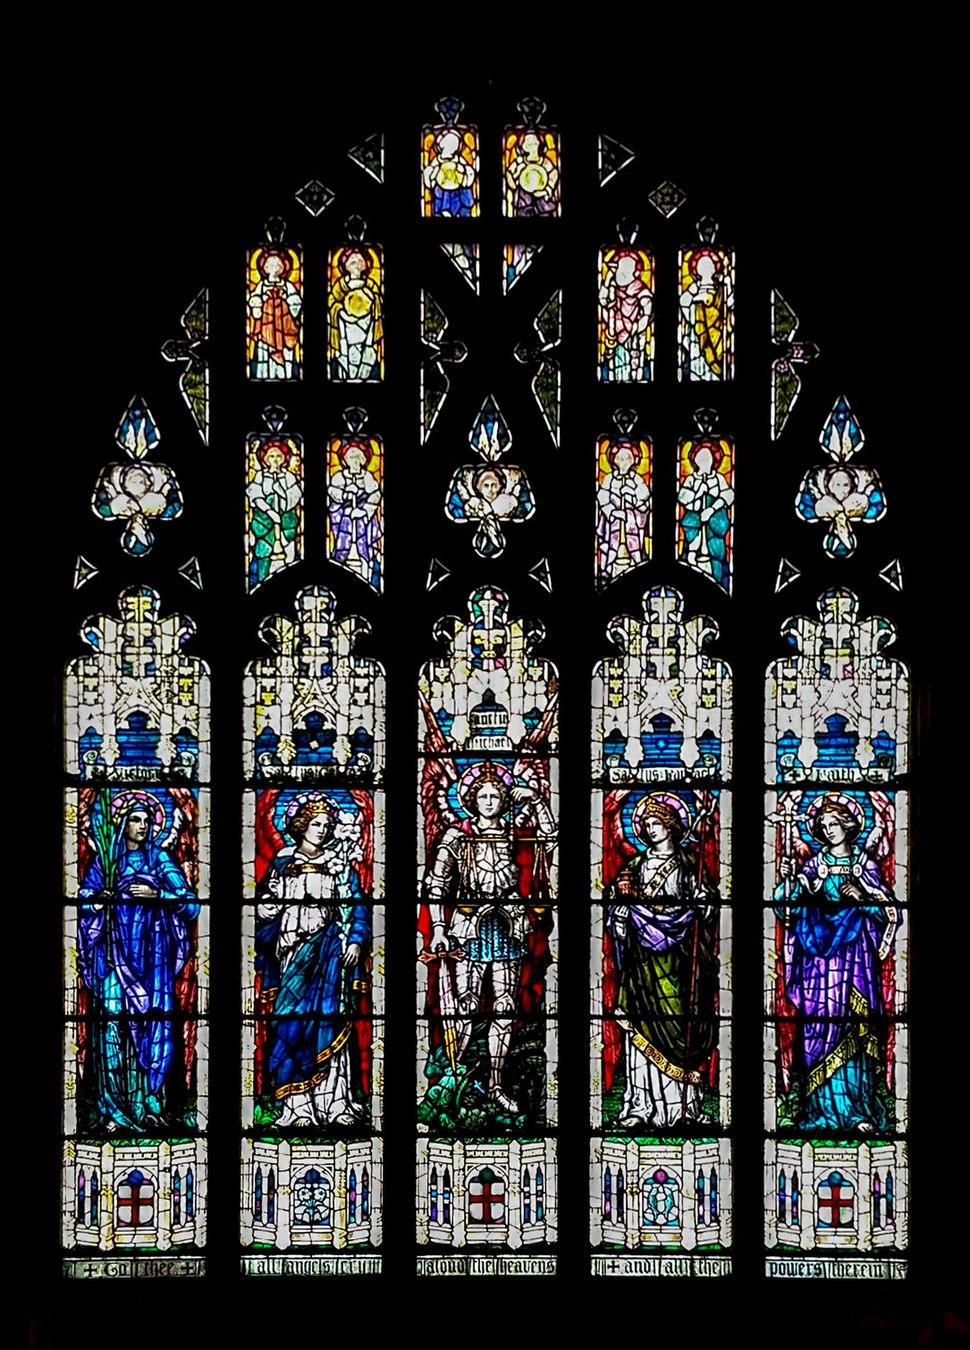 West Window, Church of the Good Shepherd (Rosemont, Pennsylvania)